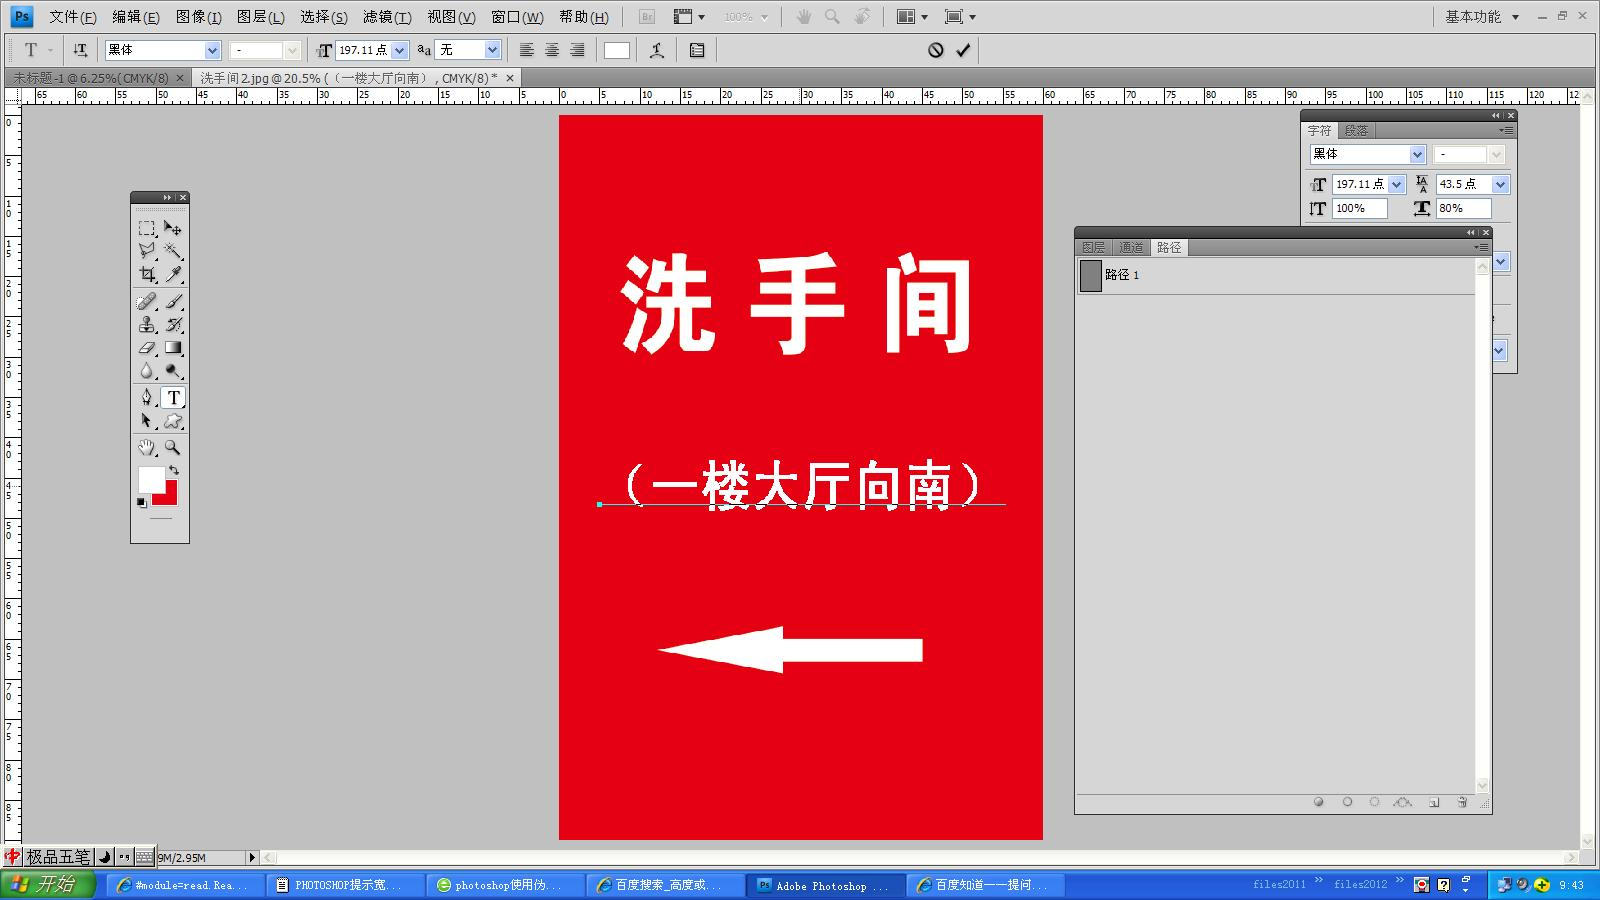 photoshop cs4 文字偽粗體變模糊不清,并有虛線邊框怎么解決?圖片